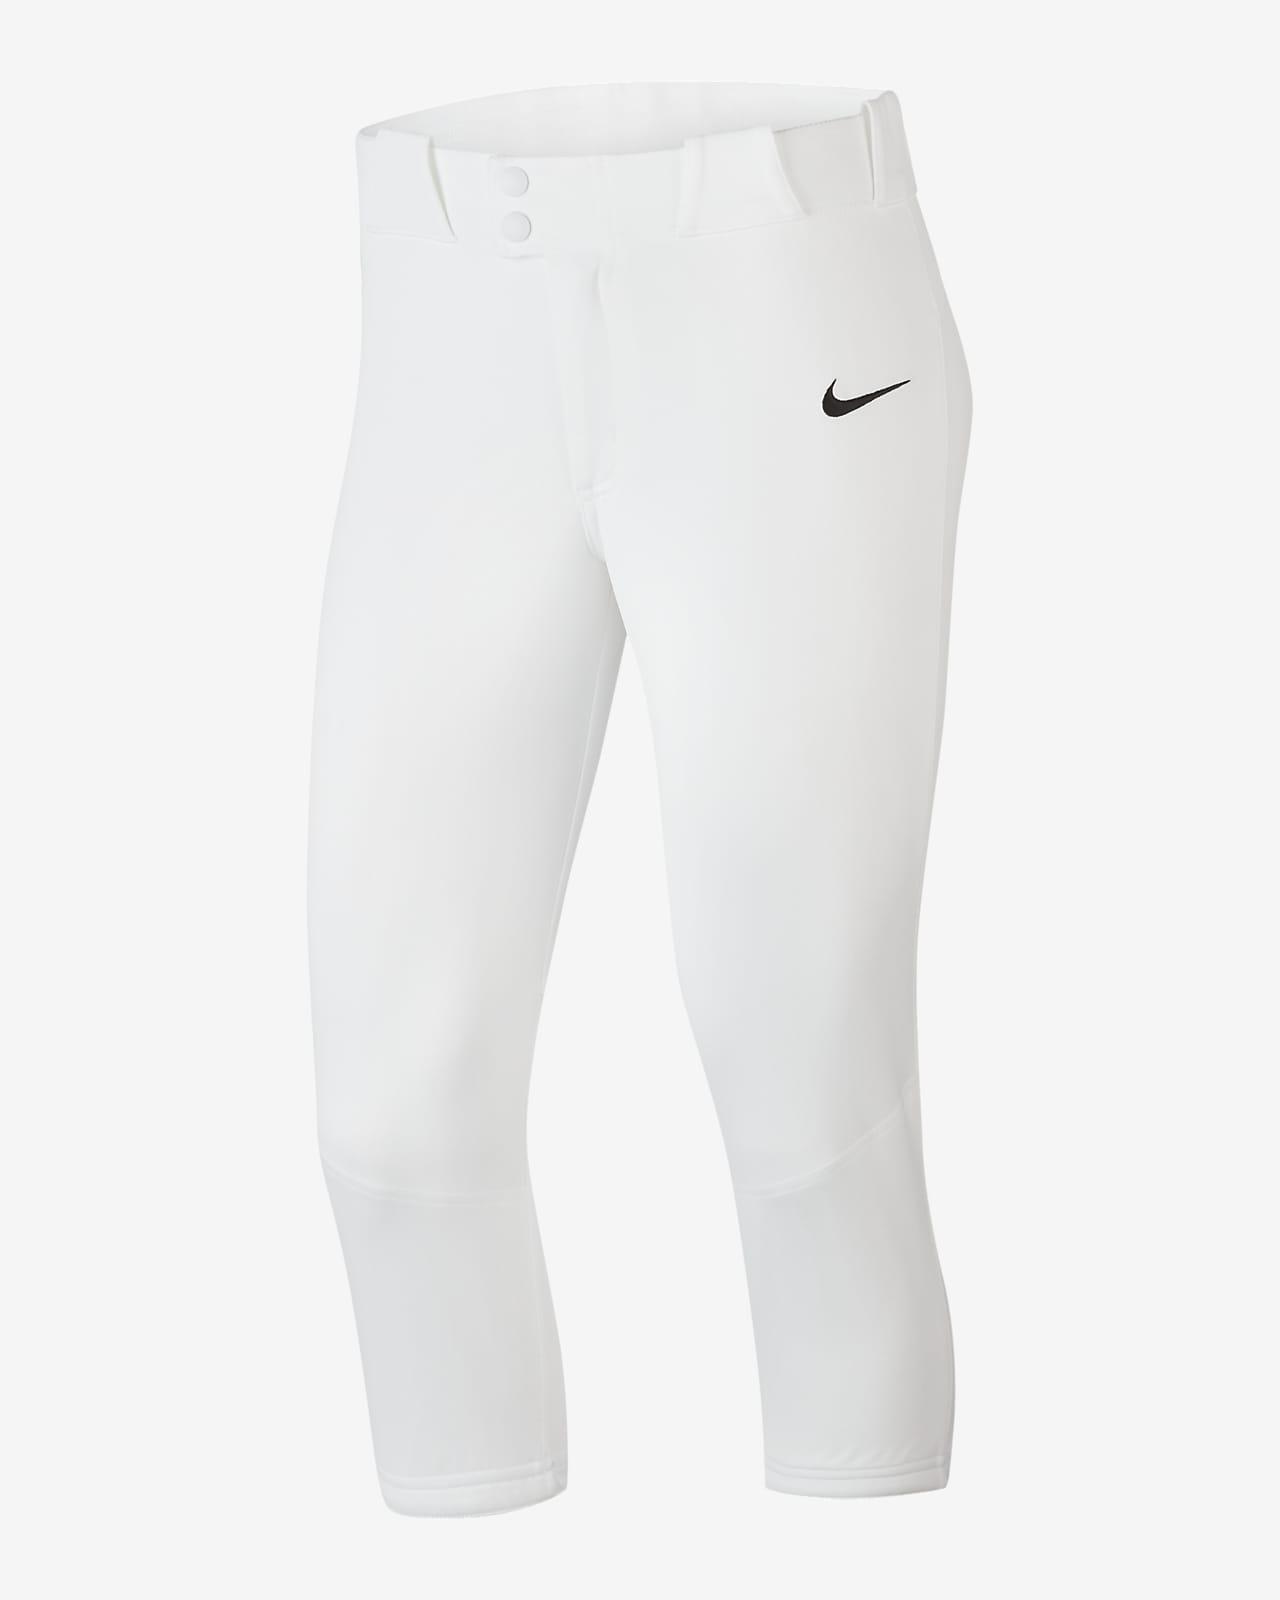 Nike Vapor Select Women's 3/4-Length Softball Pants